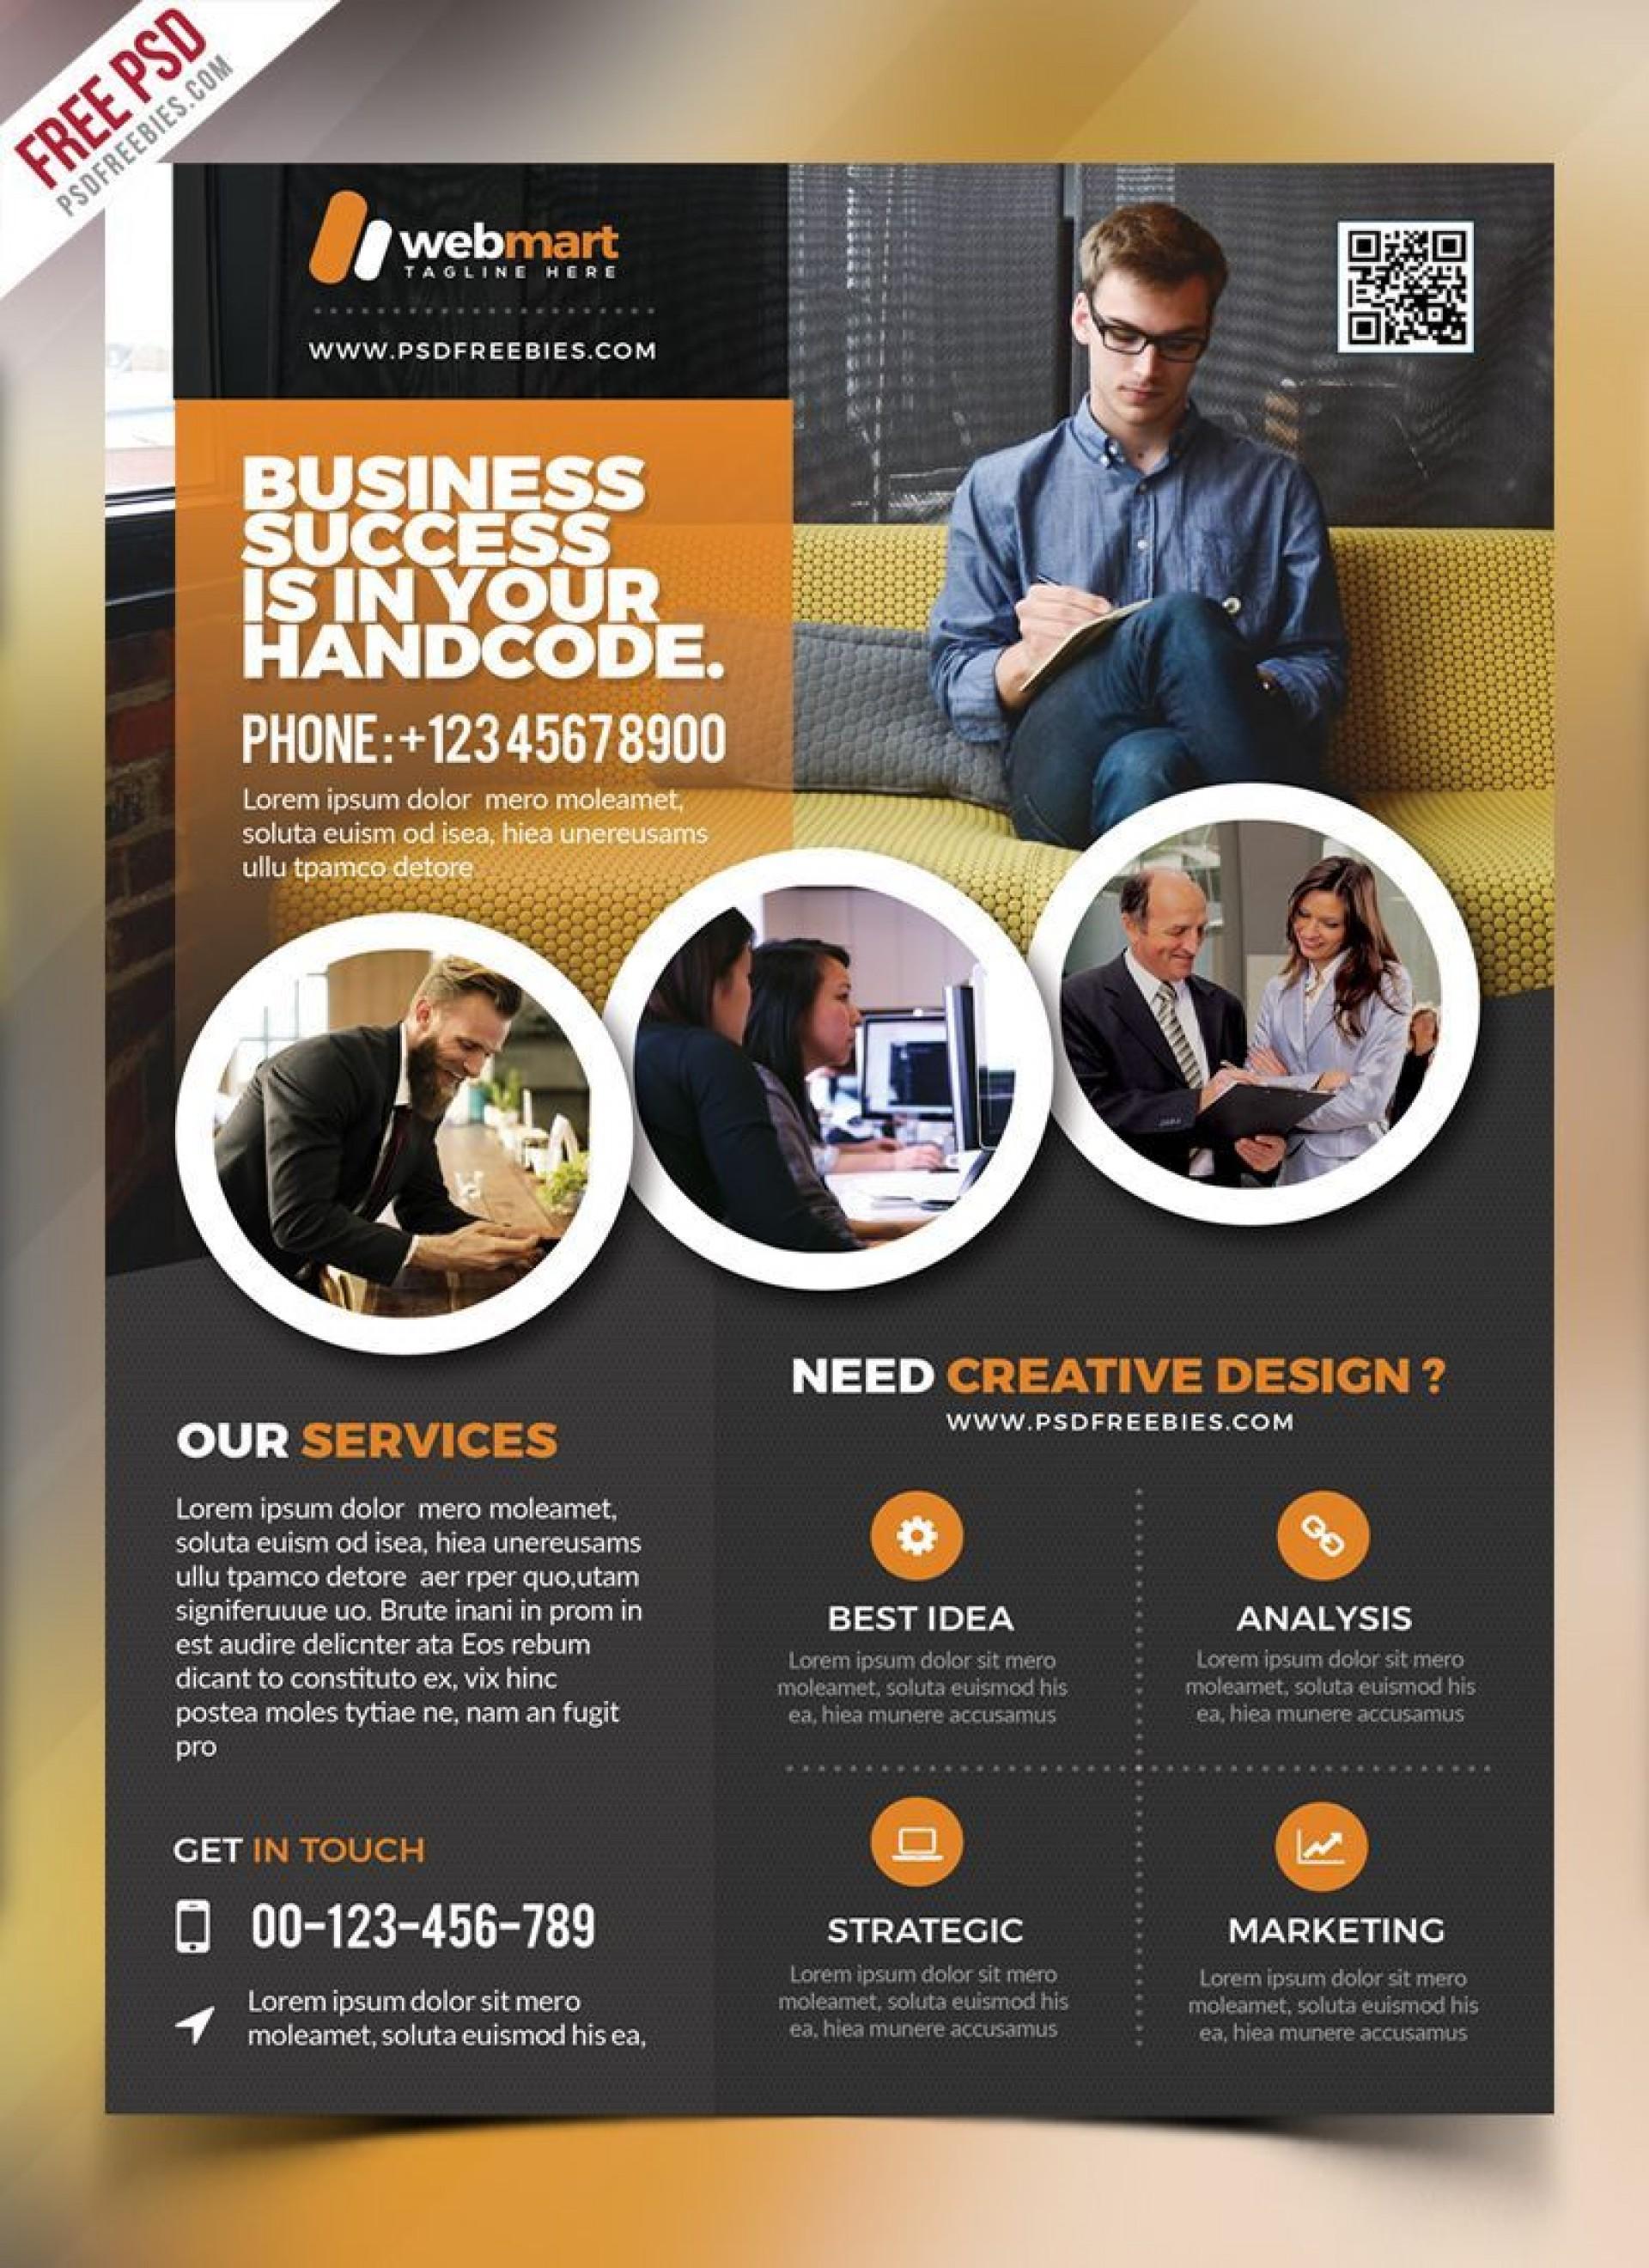 001 Surprising Free Psd Busines Brochure Template Image  Templates Flyer 2018 Corporate1920